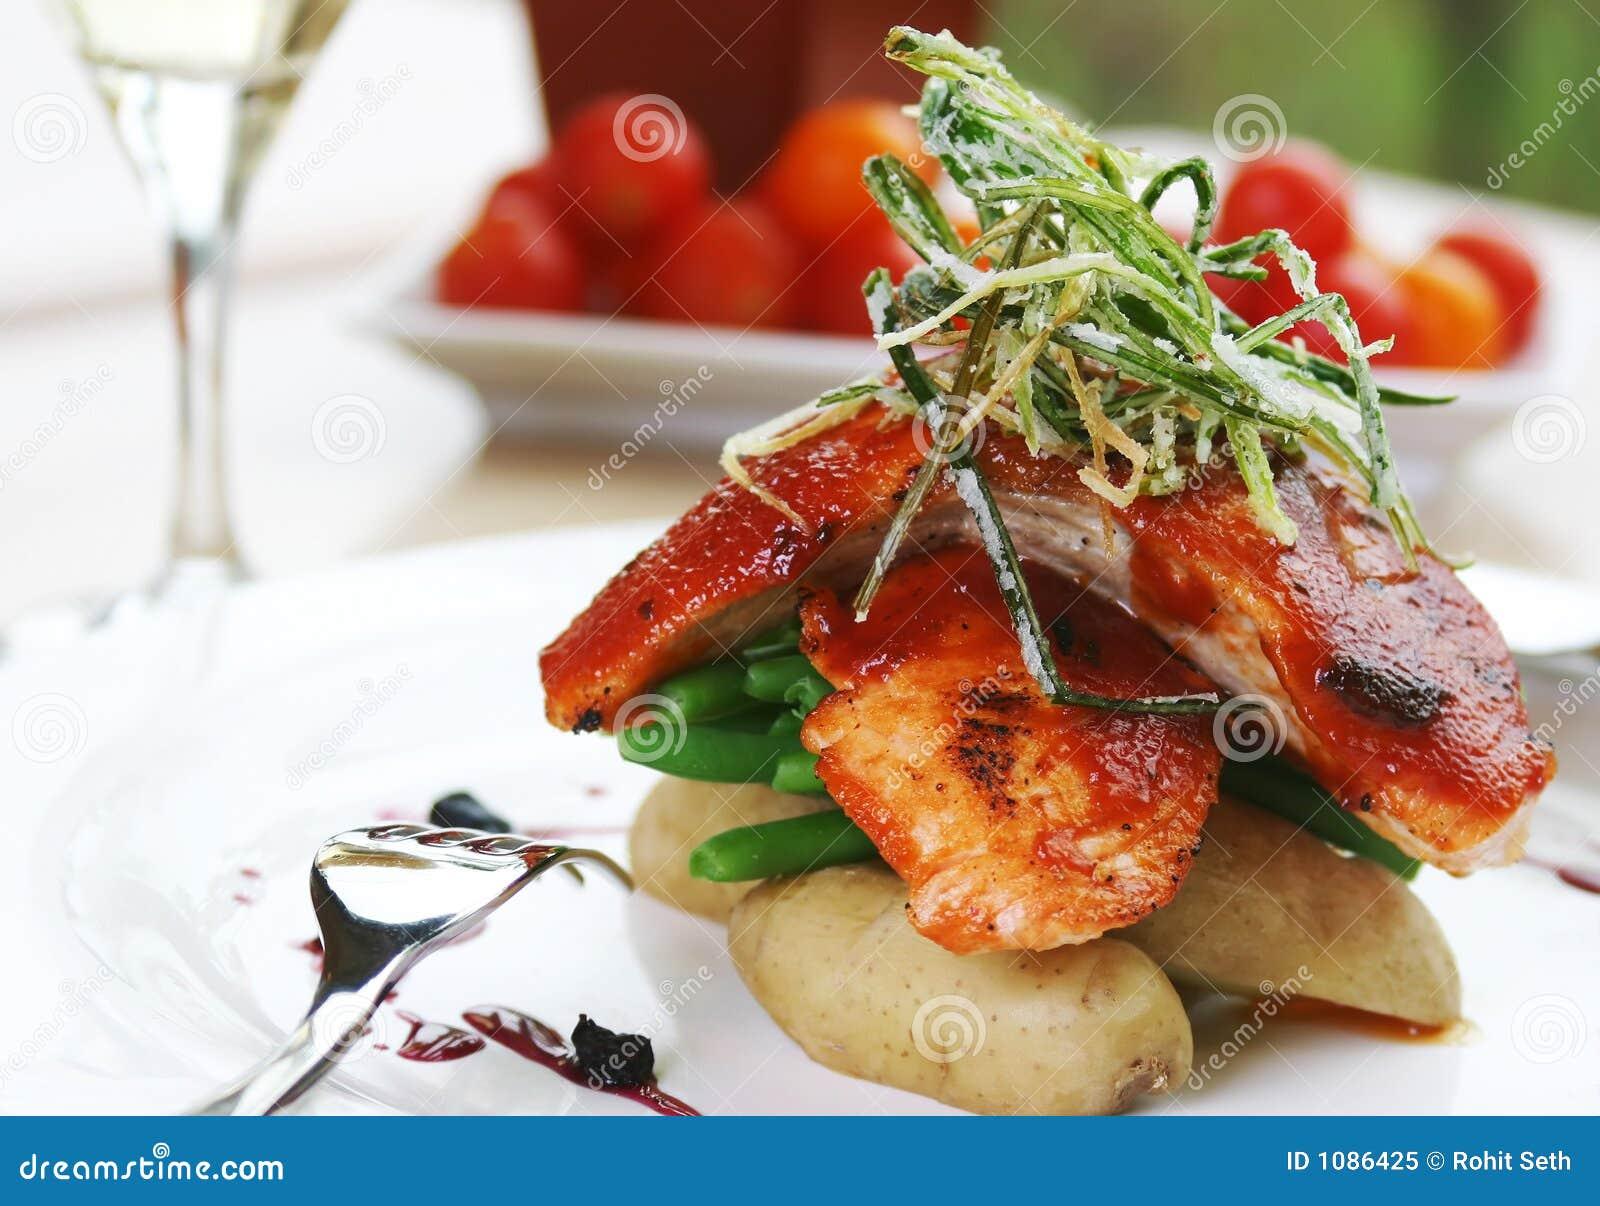 Barbecued atlantic salmon